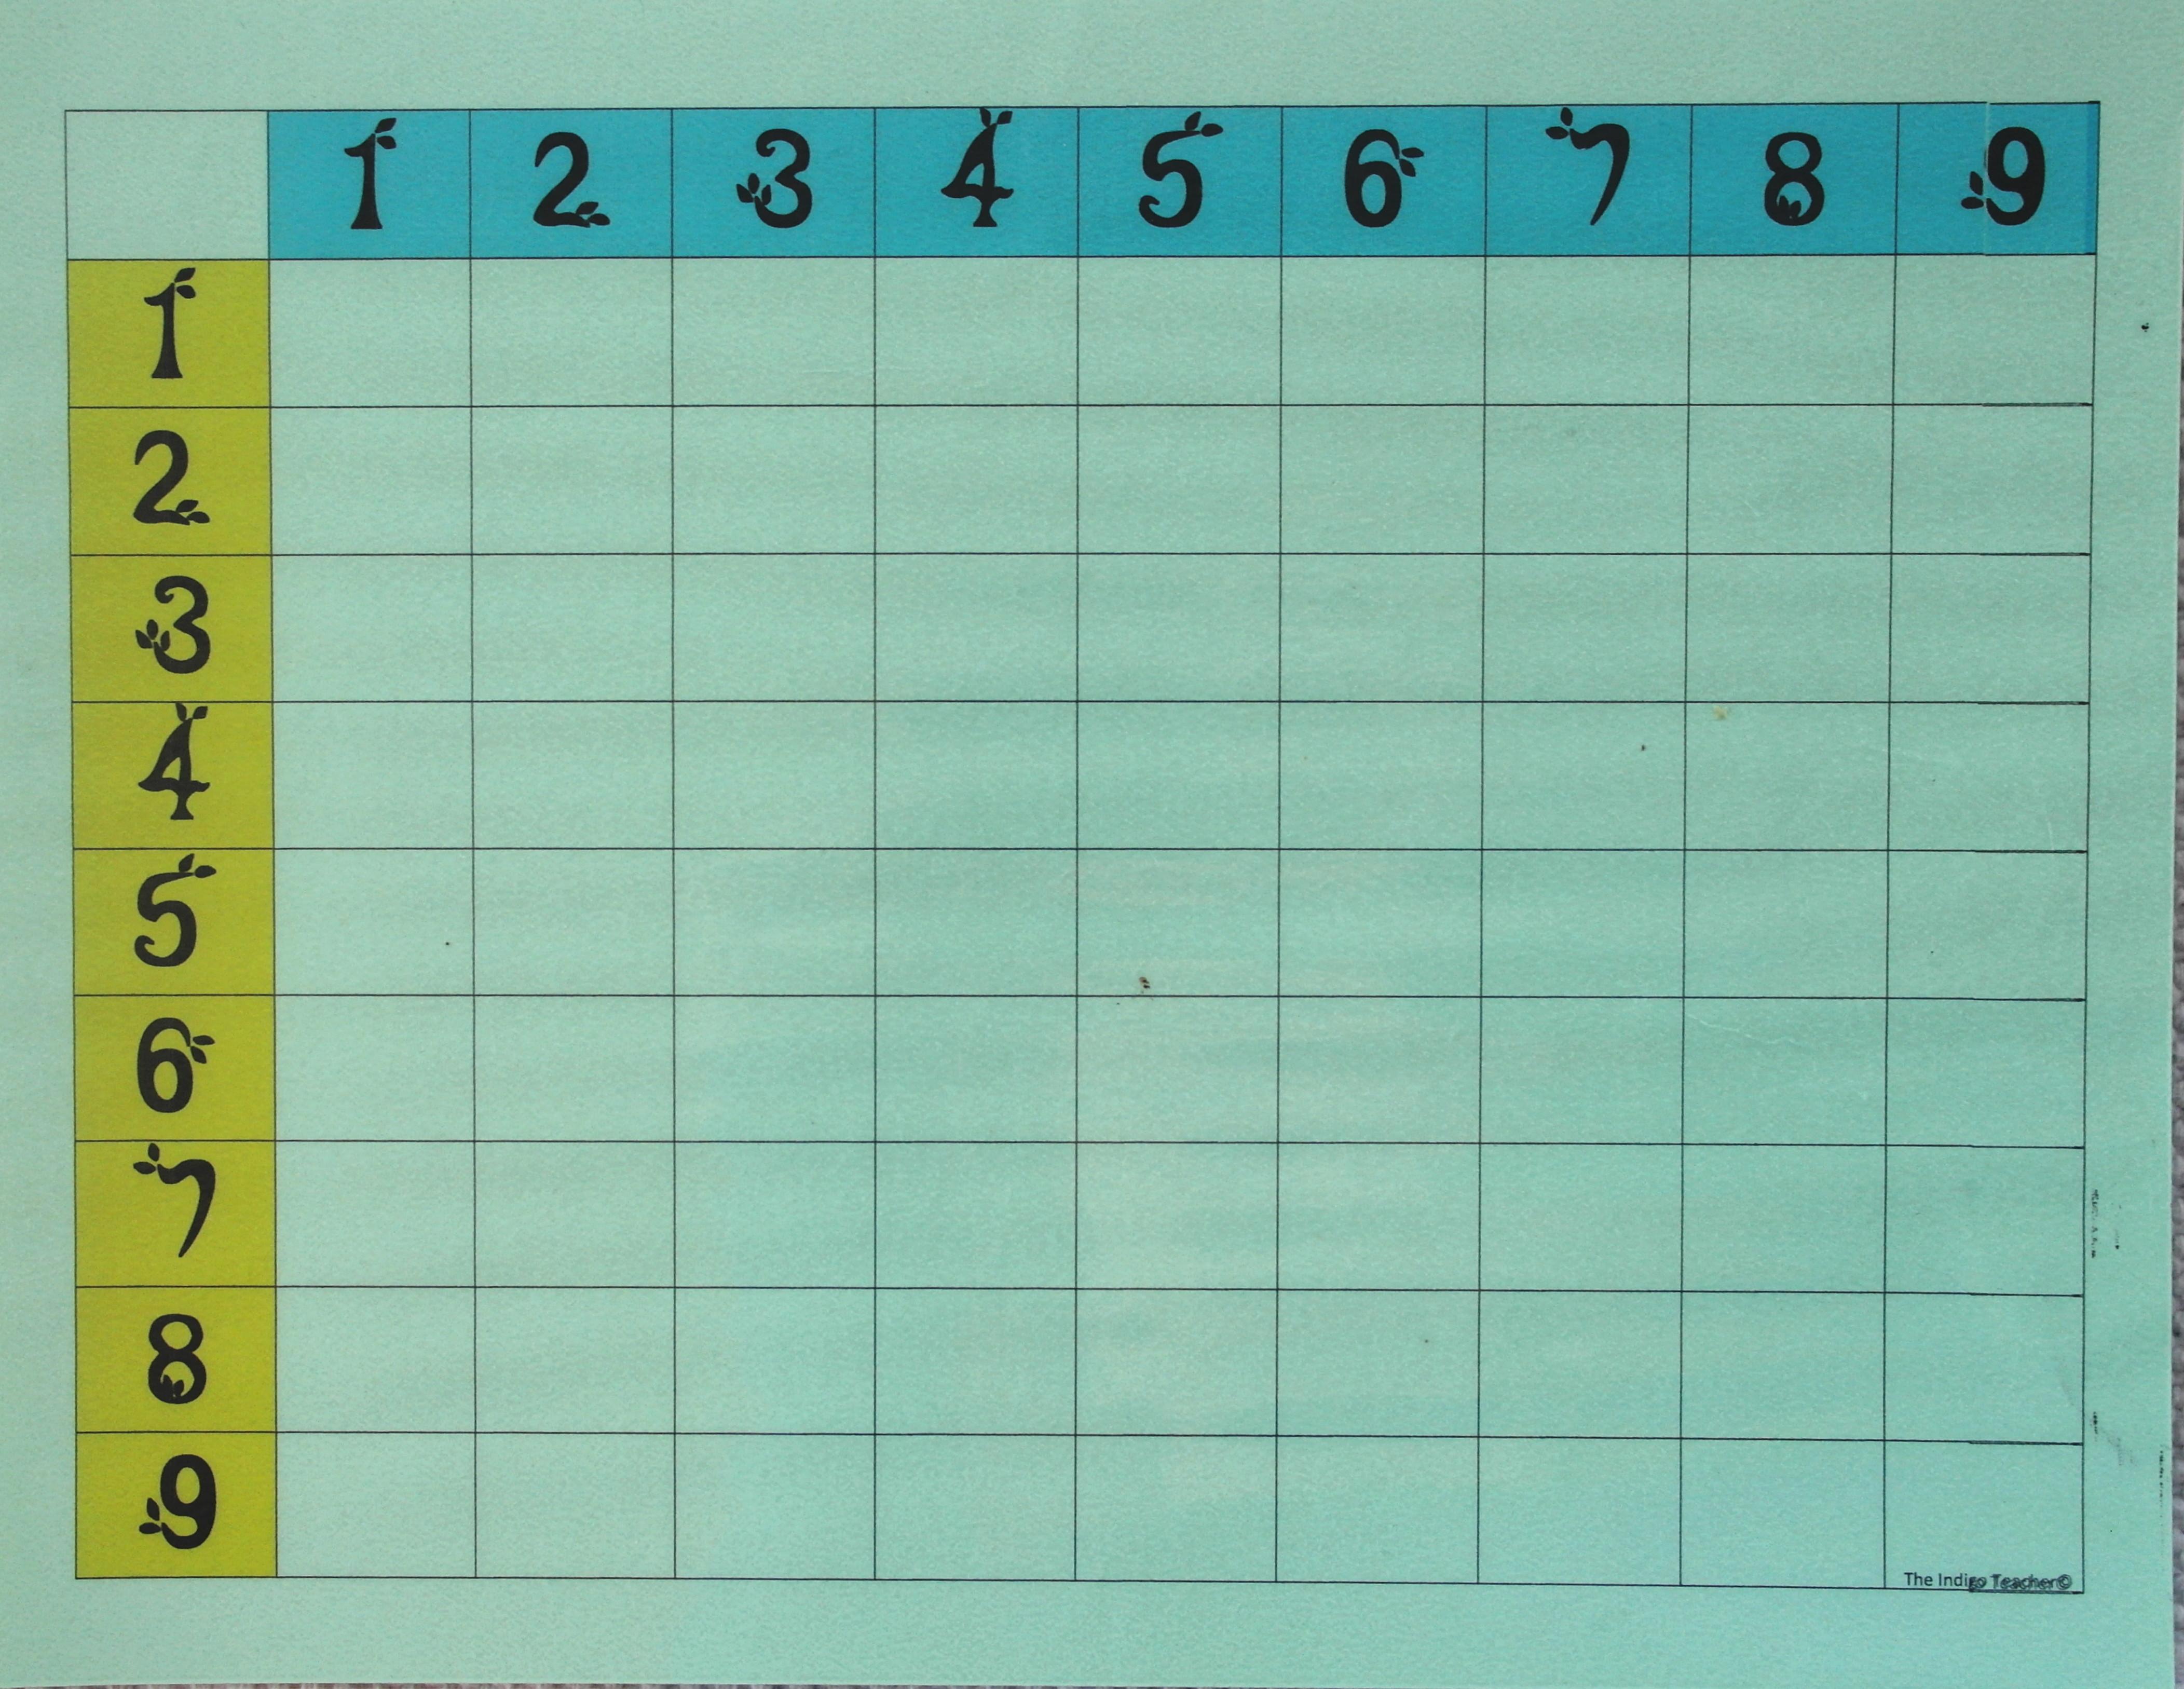 Multiplication chart the indigo teacher multiplication chart nvjuhfo Images